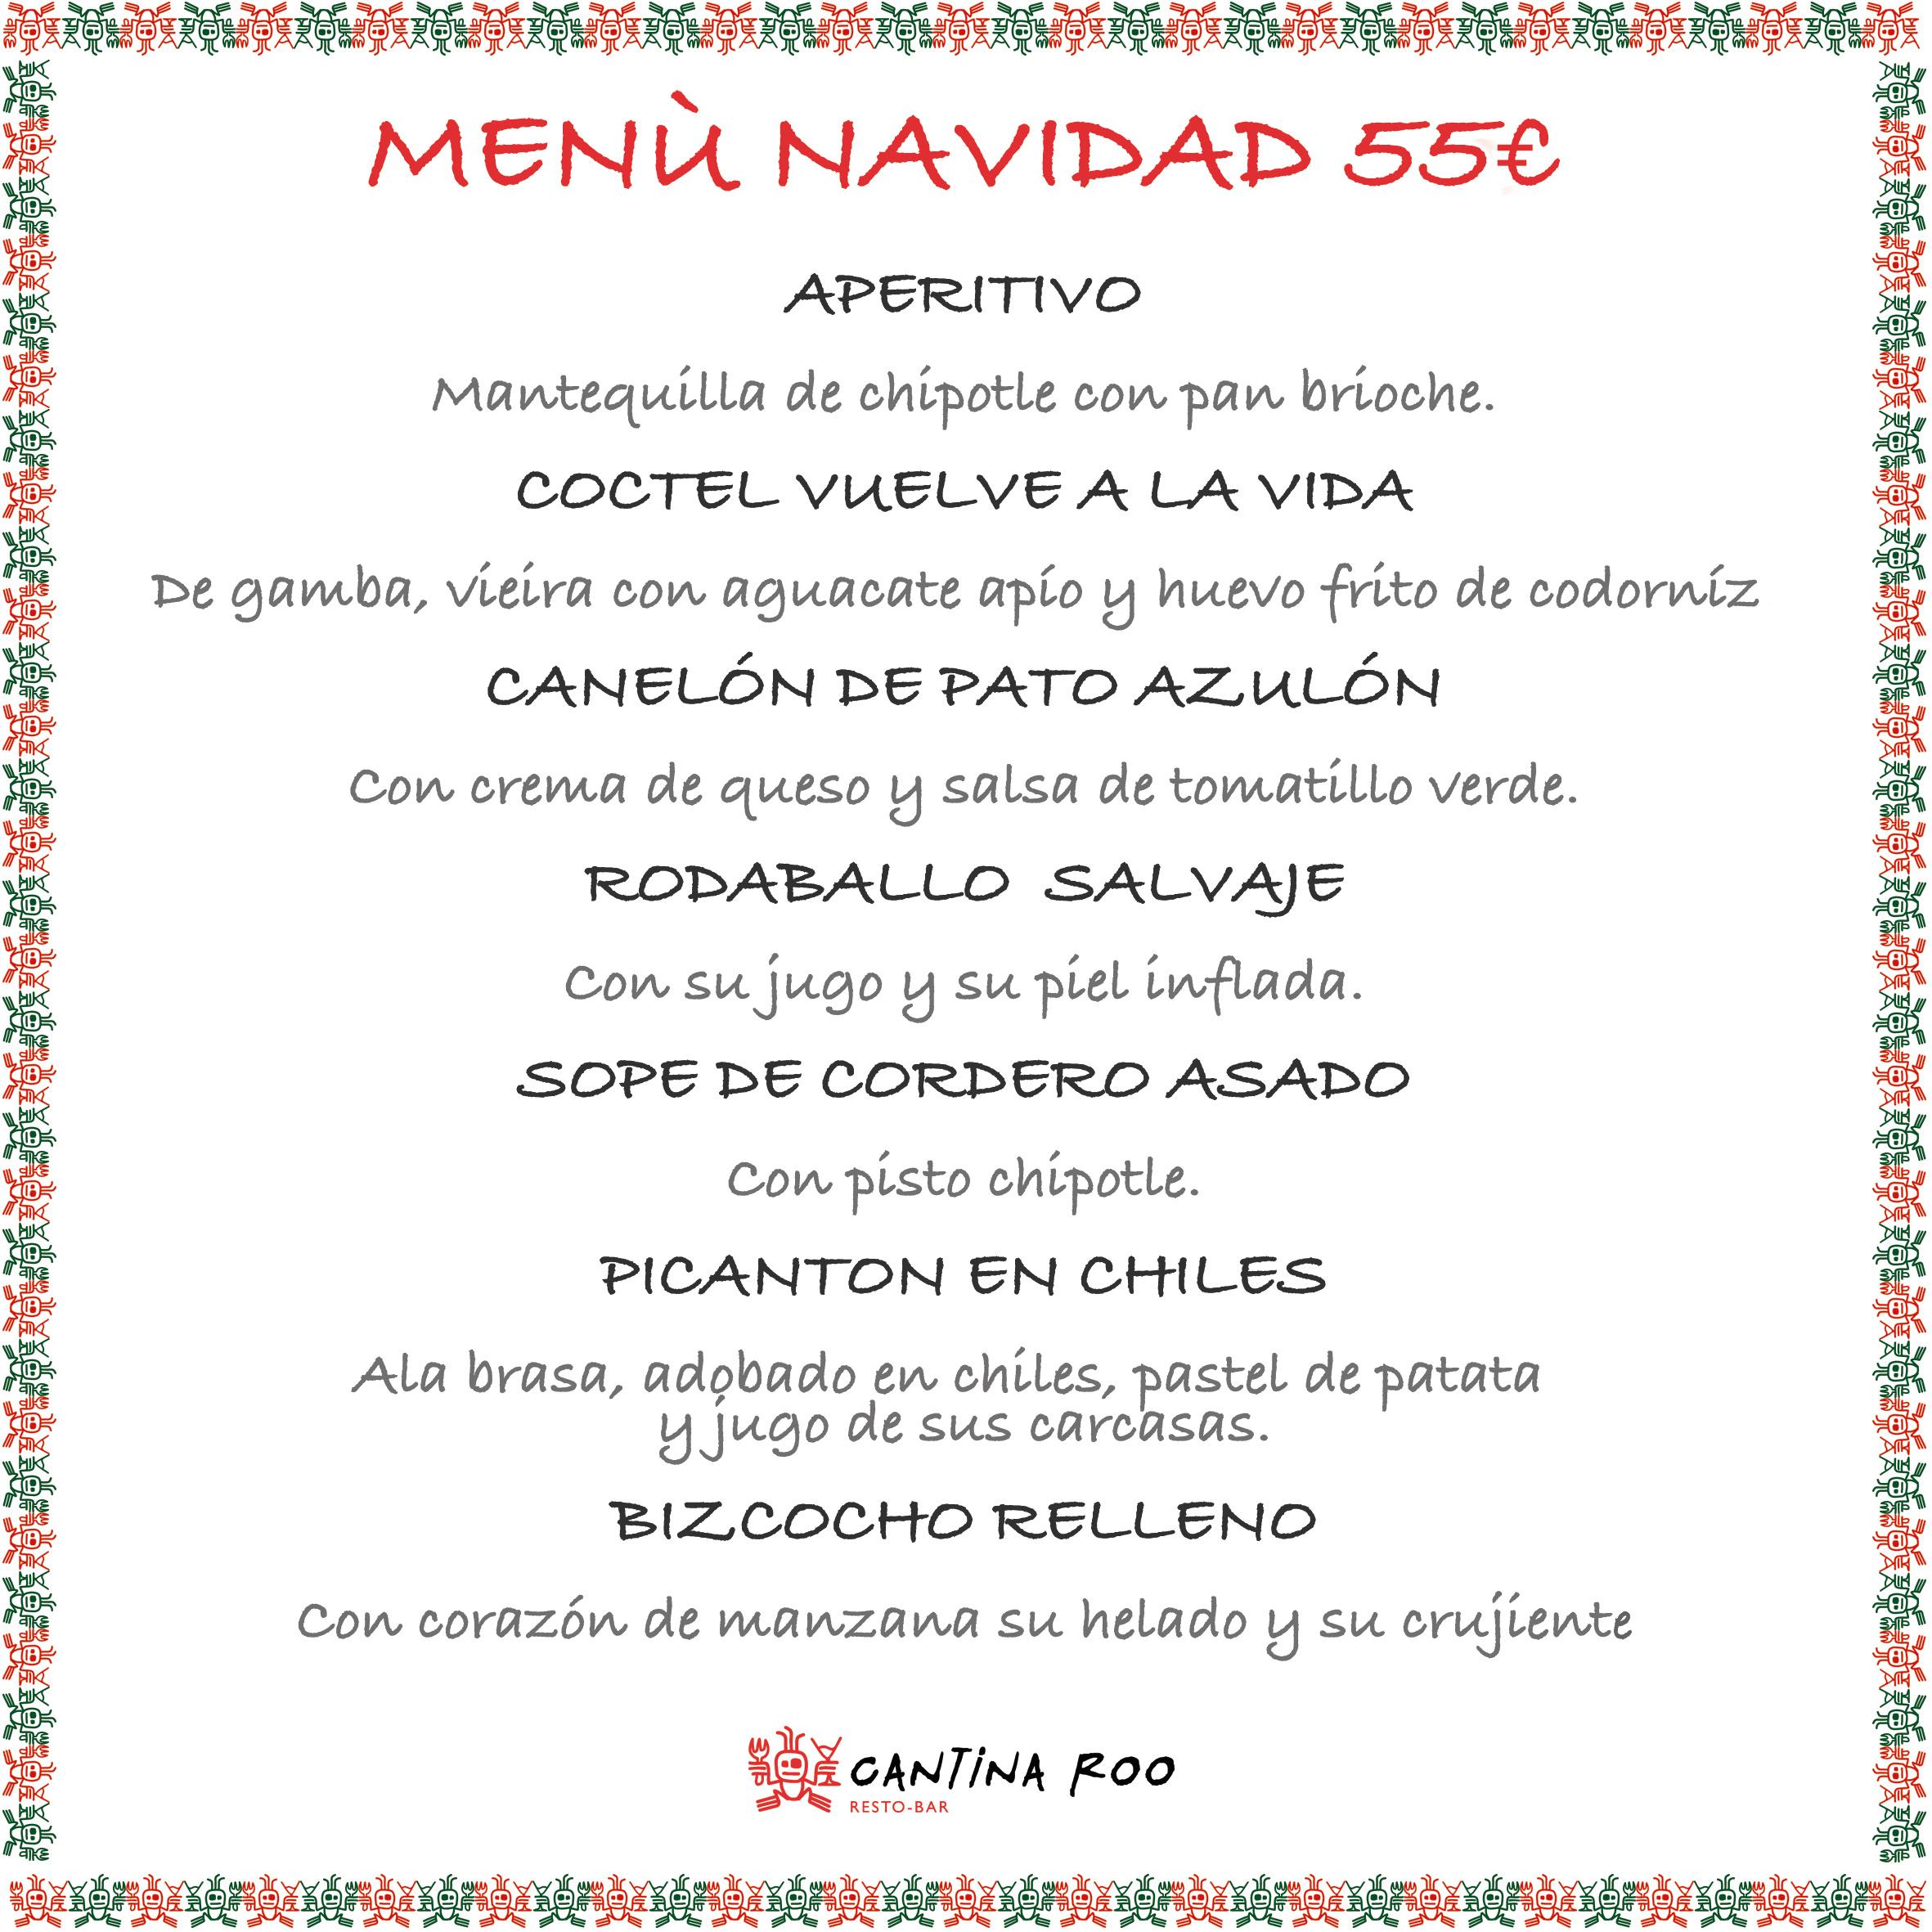 menu navidad 55